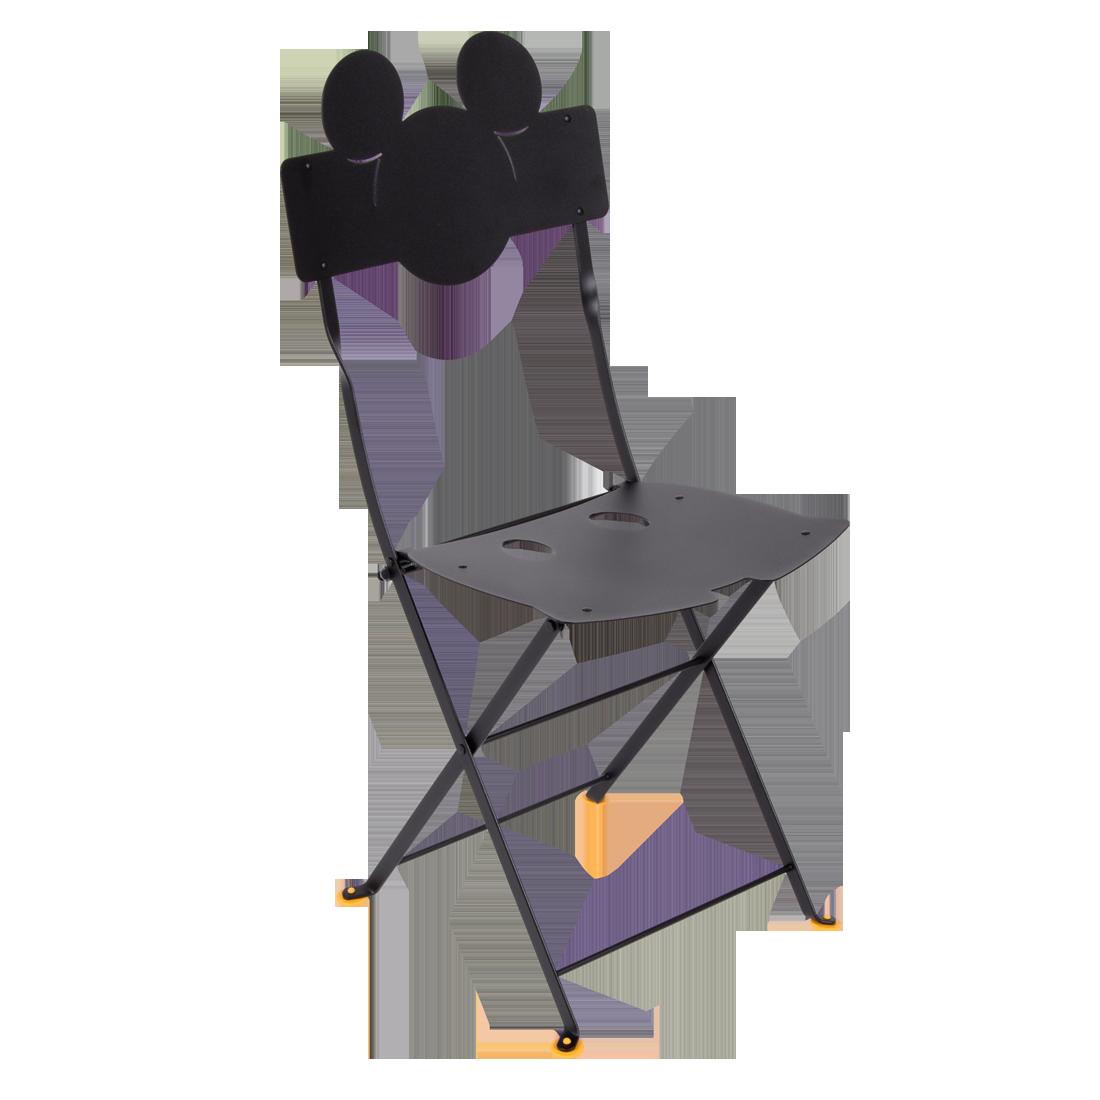 chaise bistro reglisse Mickey Mouse©